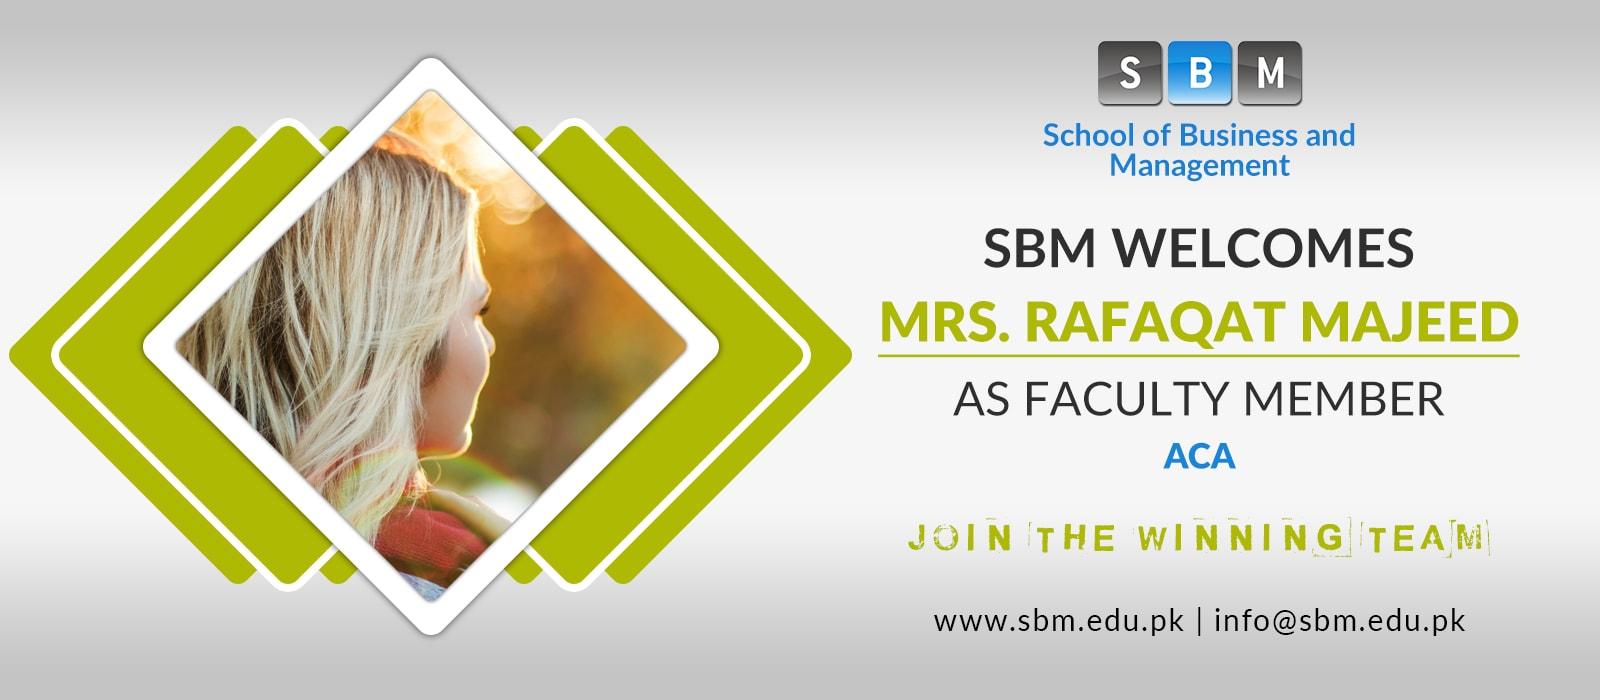 Mrs Rafaqat Majeed has joined SBM as Faculty Member